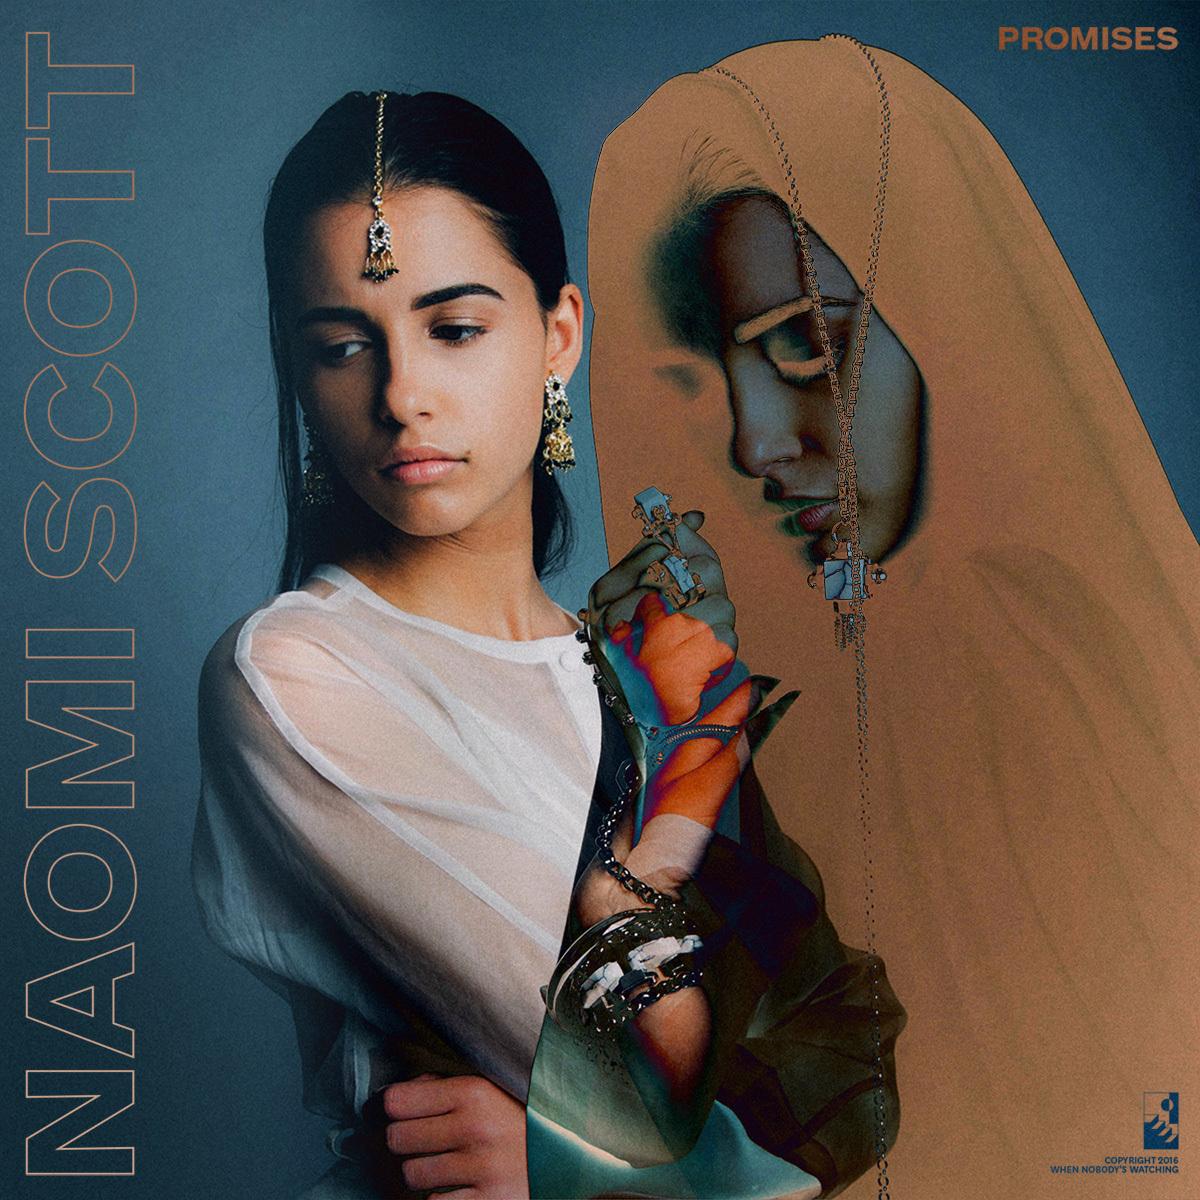 Naomi Scott - Promises EP